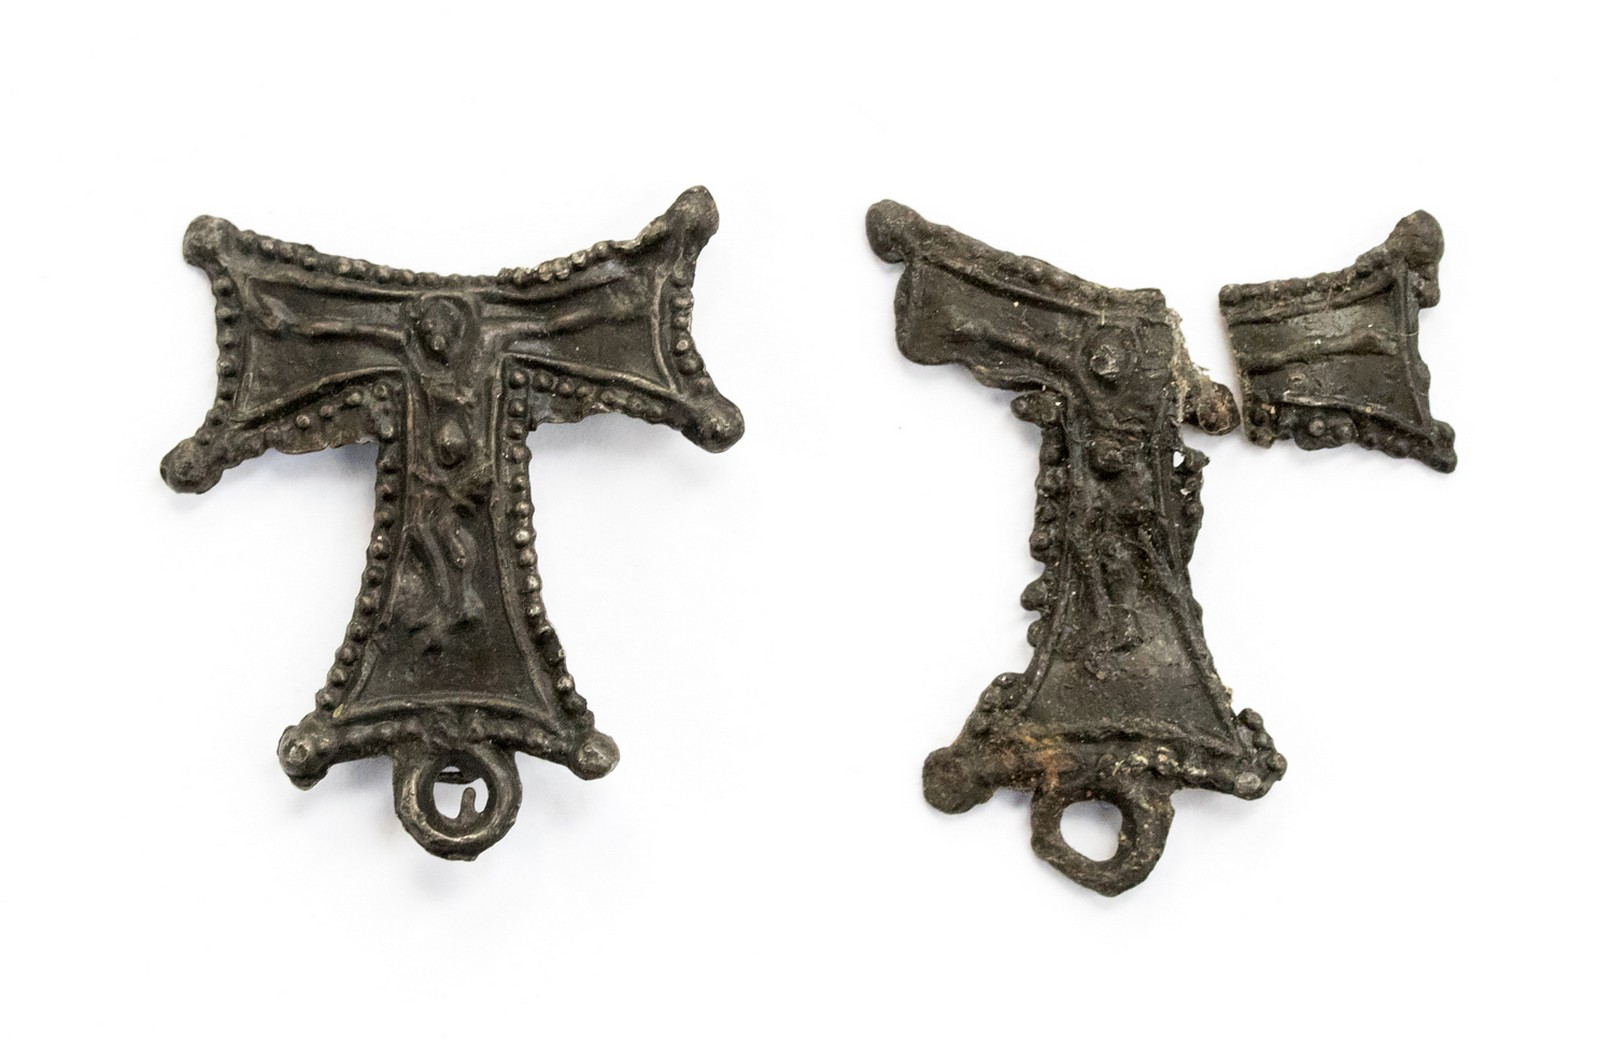 Medieval Tau cross pilgrims badge, St Anthony's Hospital, London.